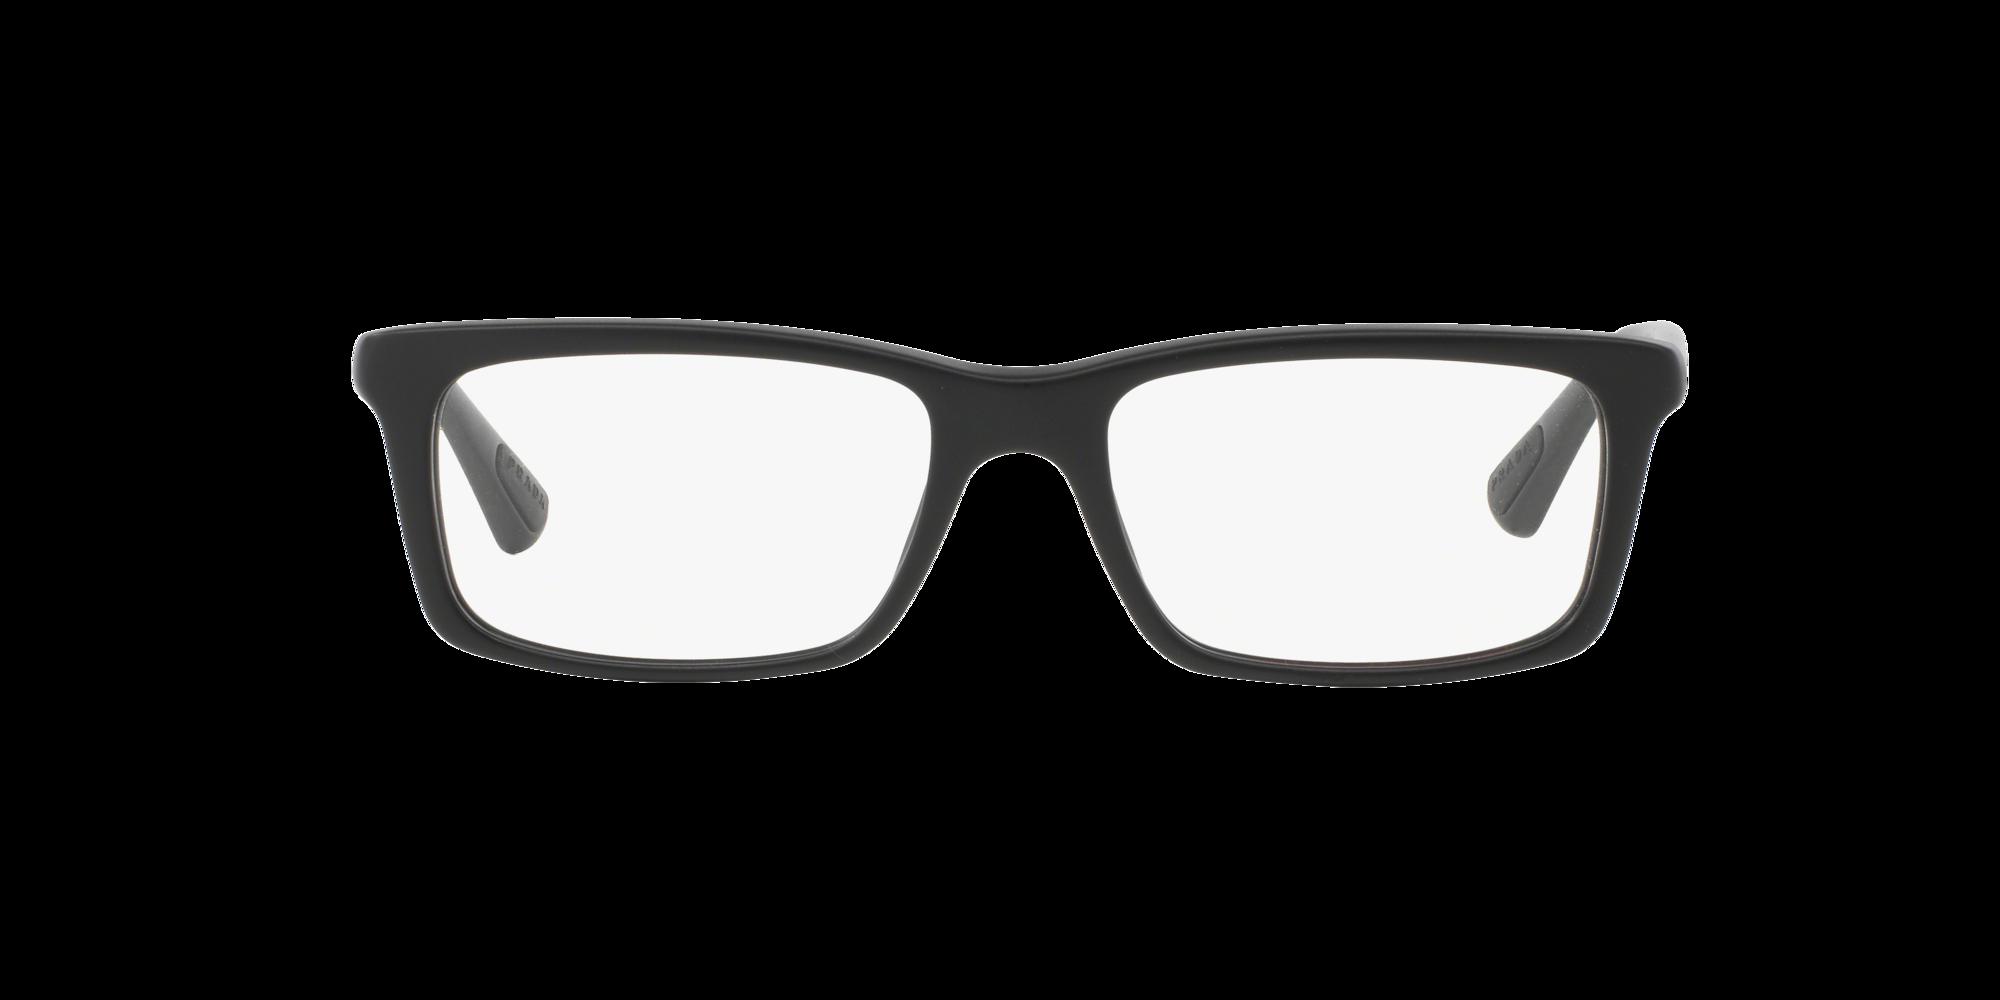 Image for 25PS 02CV from LensCrafters | Glasses, Prescription Glasses Online, Eyewear